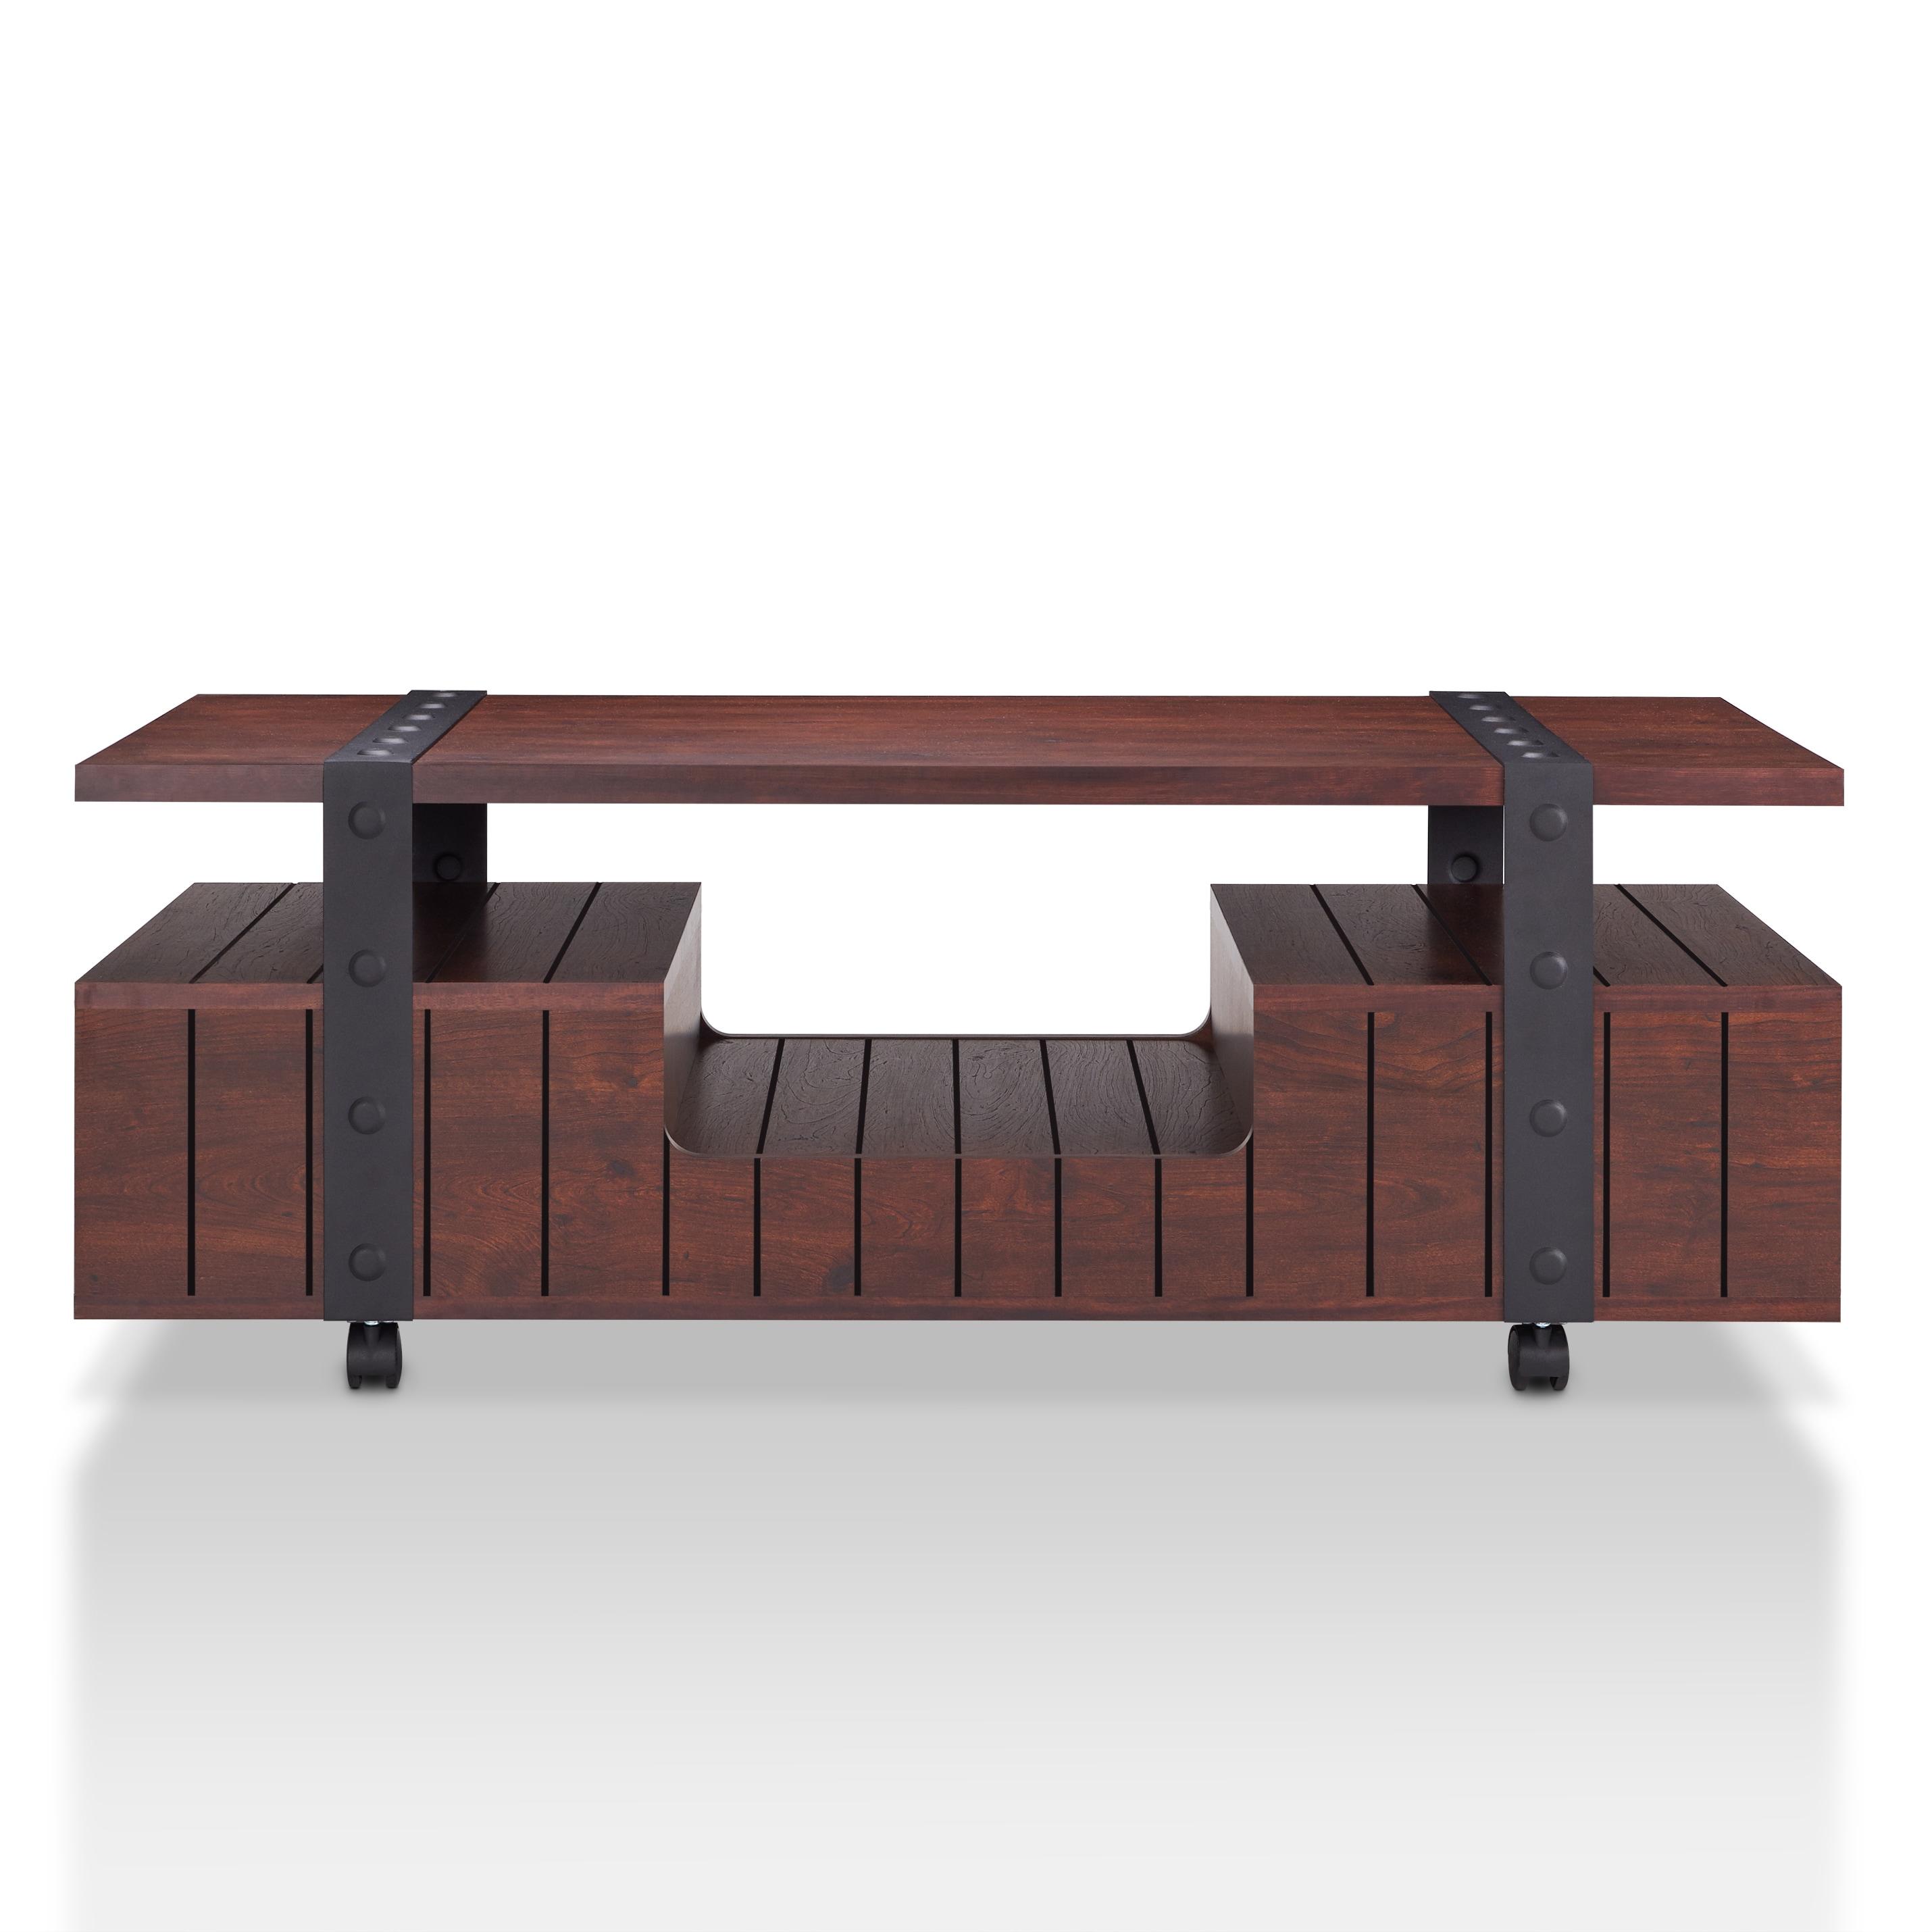 Furniture of America Bridges Industrial Vintage Walnut Plank Style